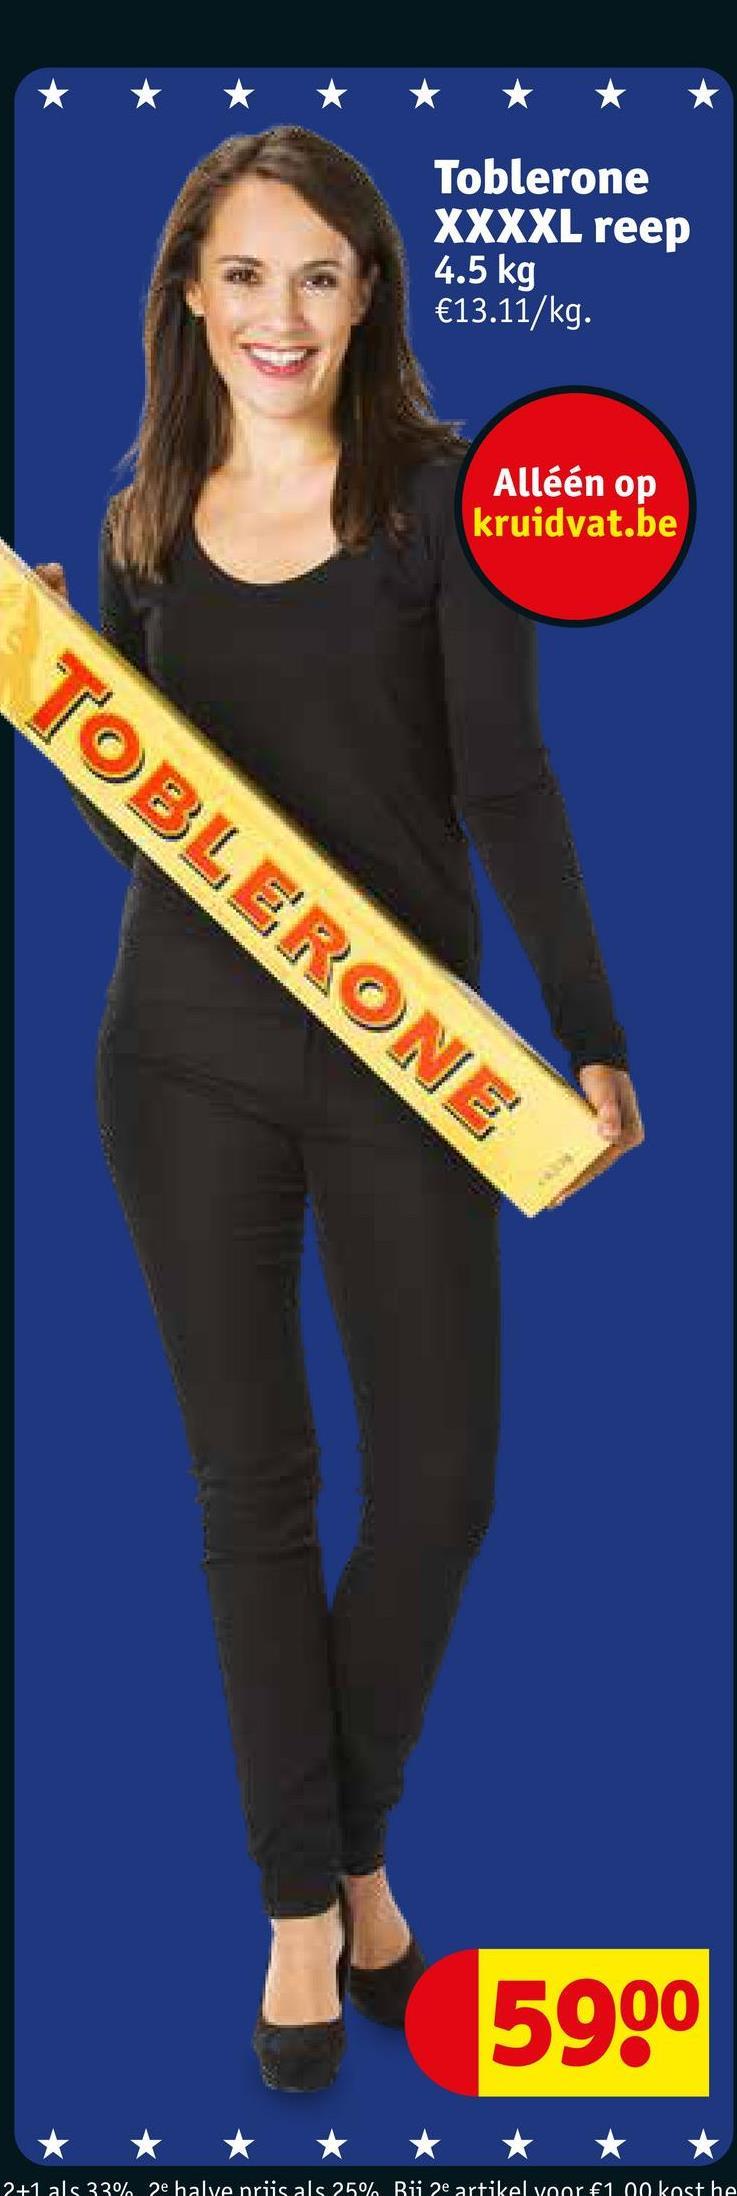 Toblerone XXXXL reep 4.5 kg €13.11/kg. Alléén op kruidvat.be TOBLERONE 5900 2+1 als 33% 2e halve priis als 25% Bü 2e artikel voor €100 kost he